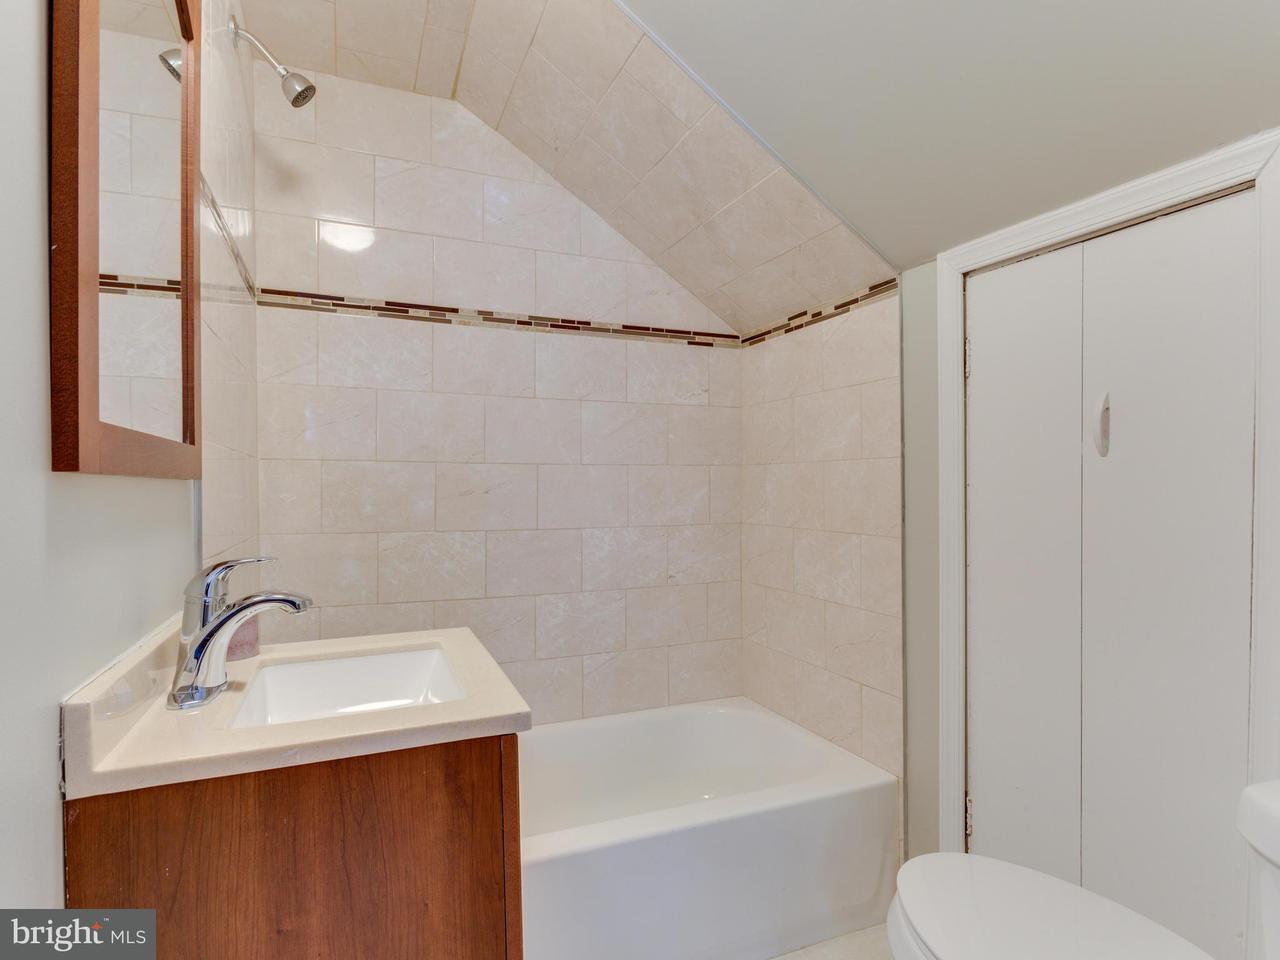 Additional photo for property listing at 1211 Farragut St Nw 1211 Farragut St Nw Washington, Distrito De Columbia 20011 Estados Unidos